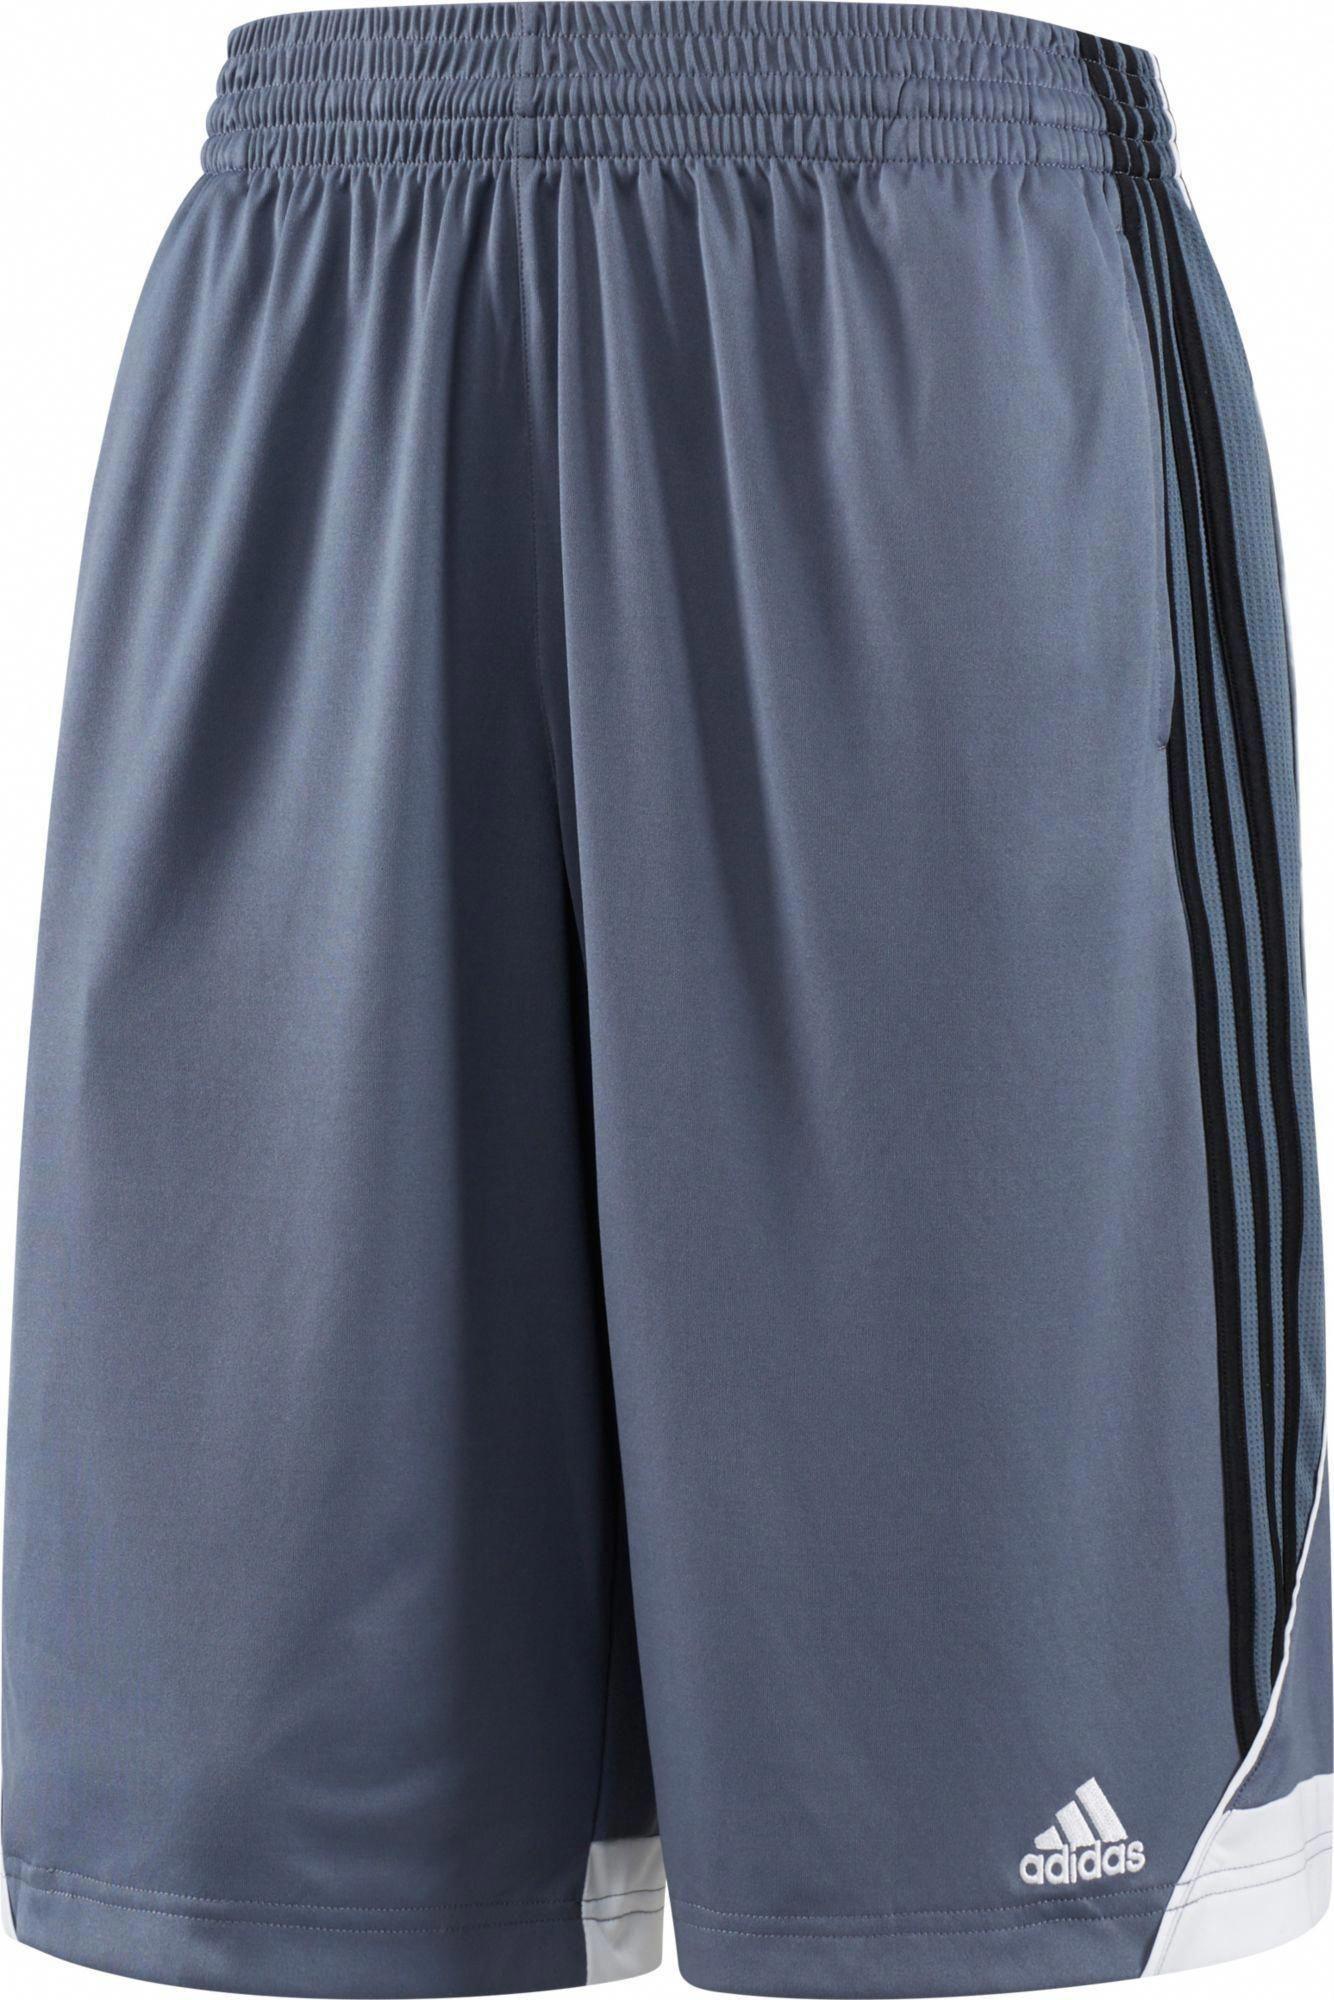 Basketball Y8 Basketballorderonline Code 9372829240 Adidasbasketballshoes Basketball Game Outfit Basketball Shorts Adidas Basketball Shoes